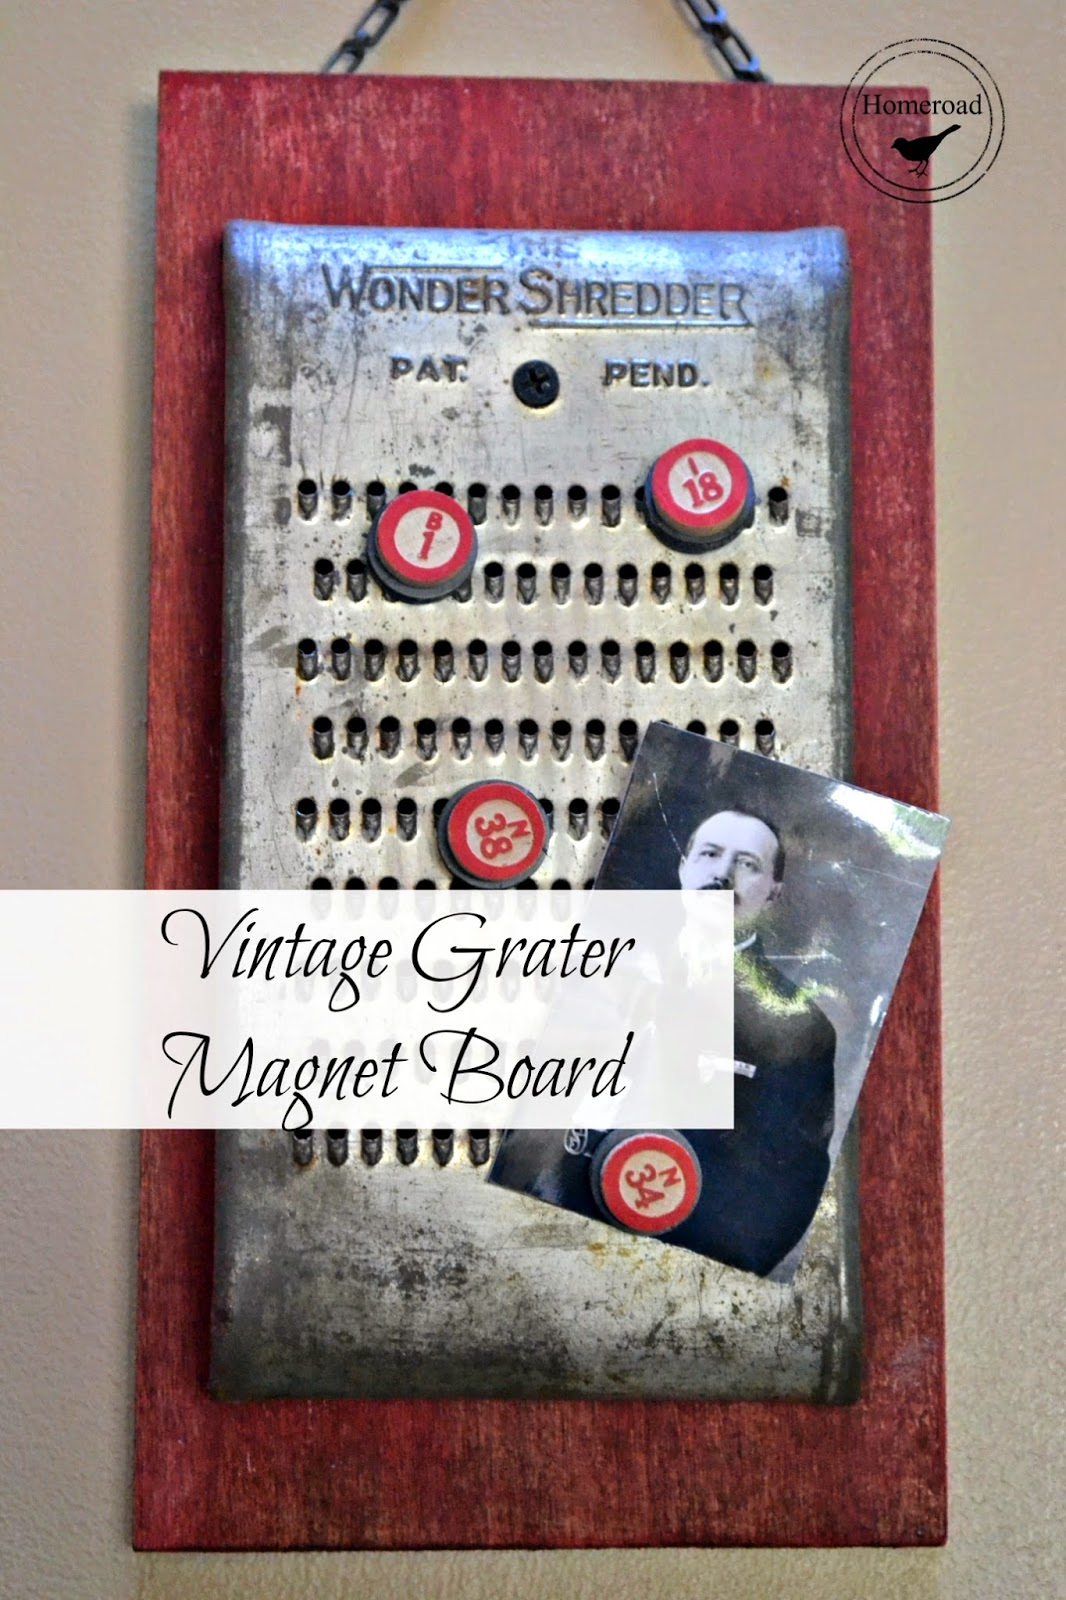 vintage-cheese-grater-magnet-board www.homeroad.net